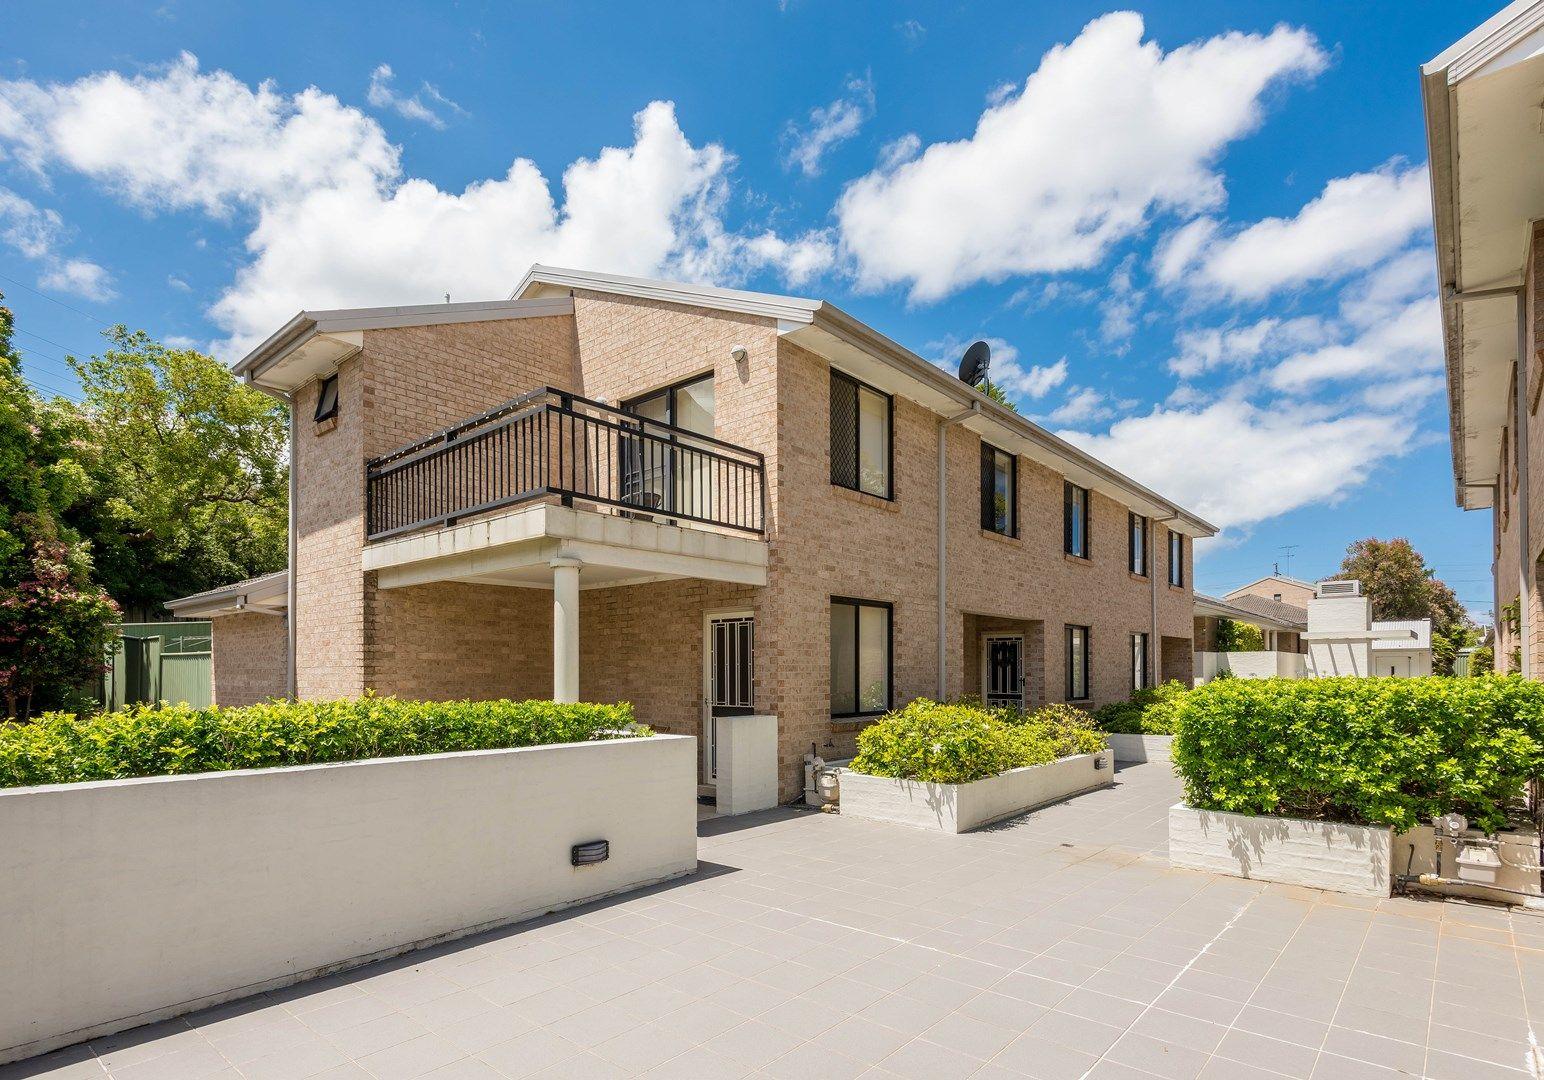 2/60-64 Merton Street, Sutherland NSW 2232, Image 0